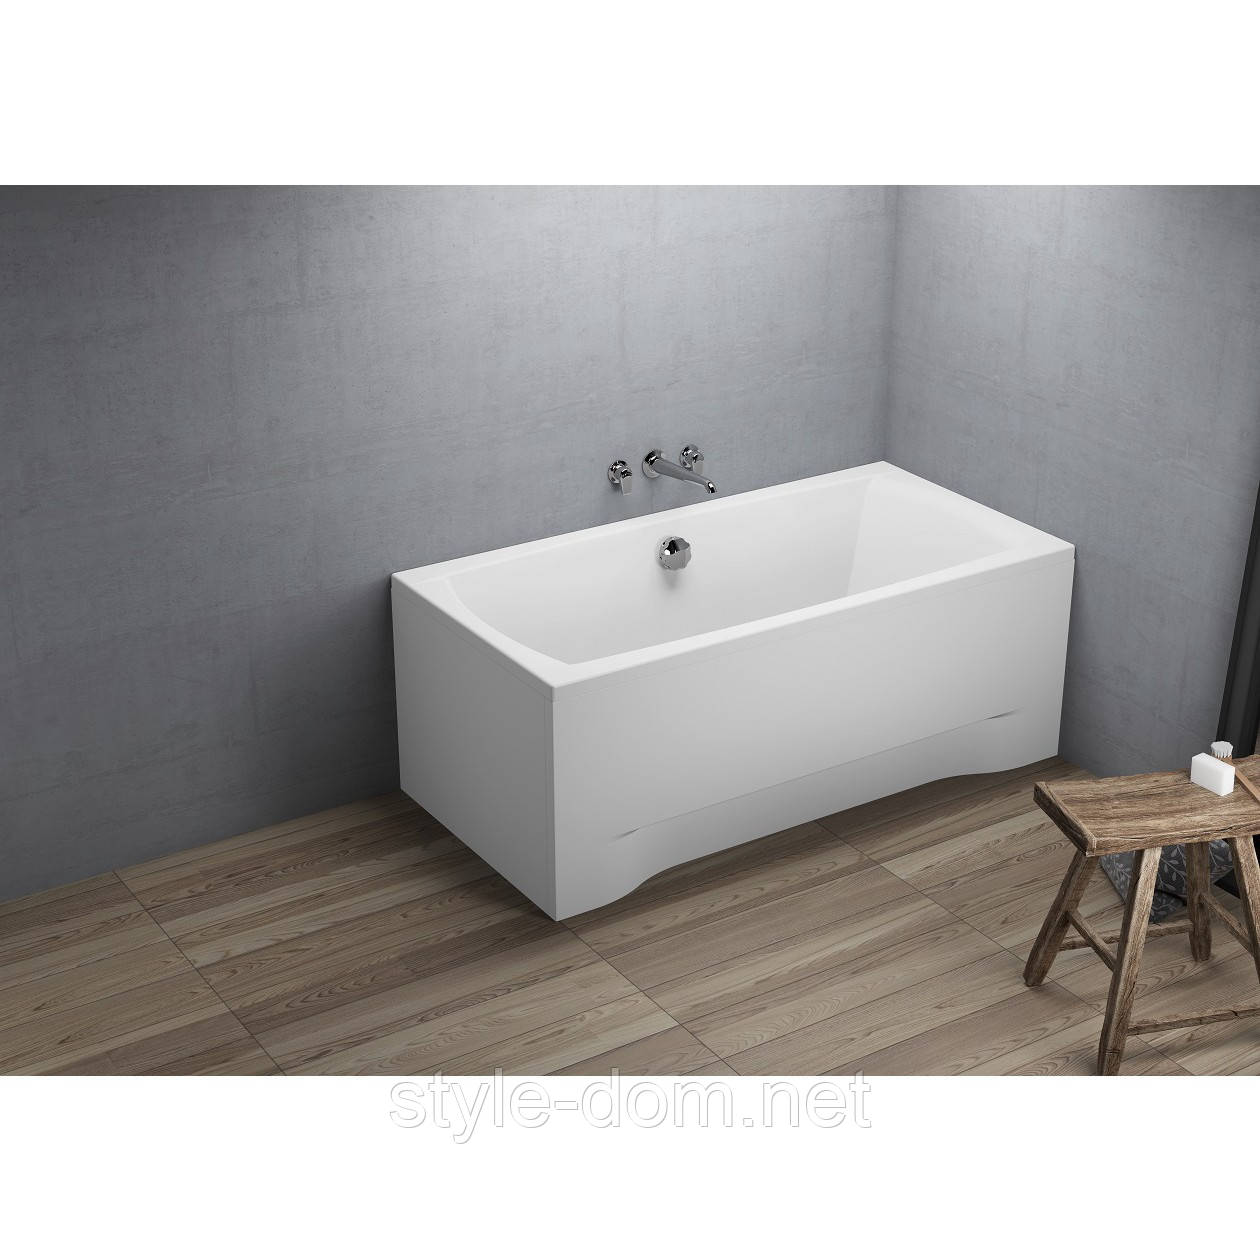 Ванна прямоугольная CAPRI NEW 140x70